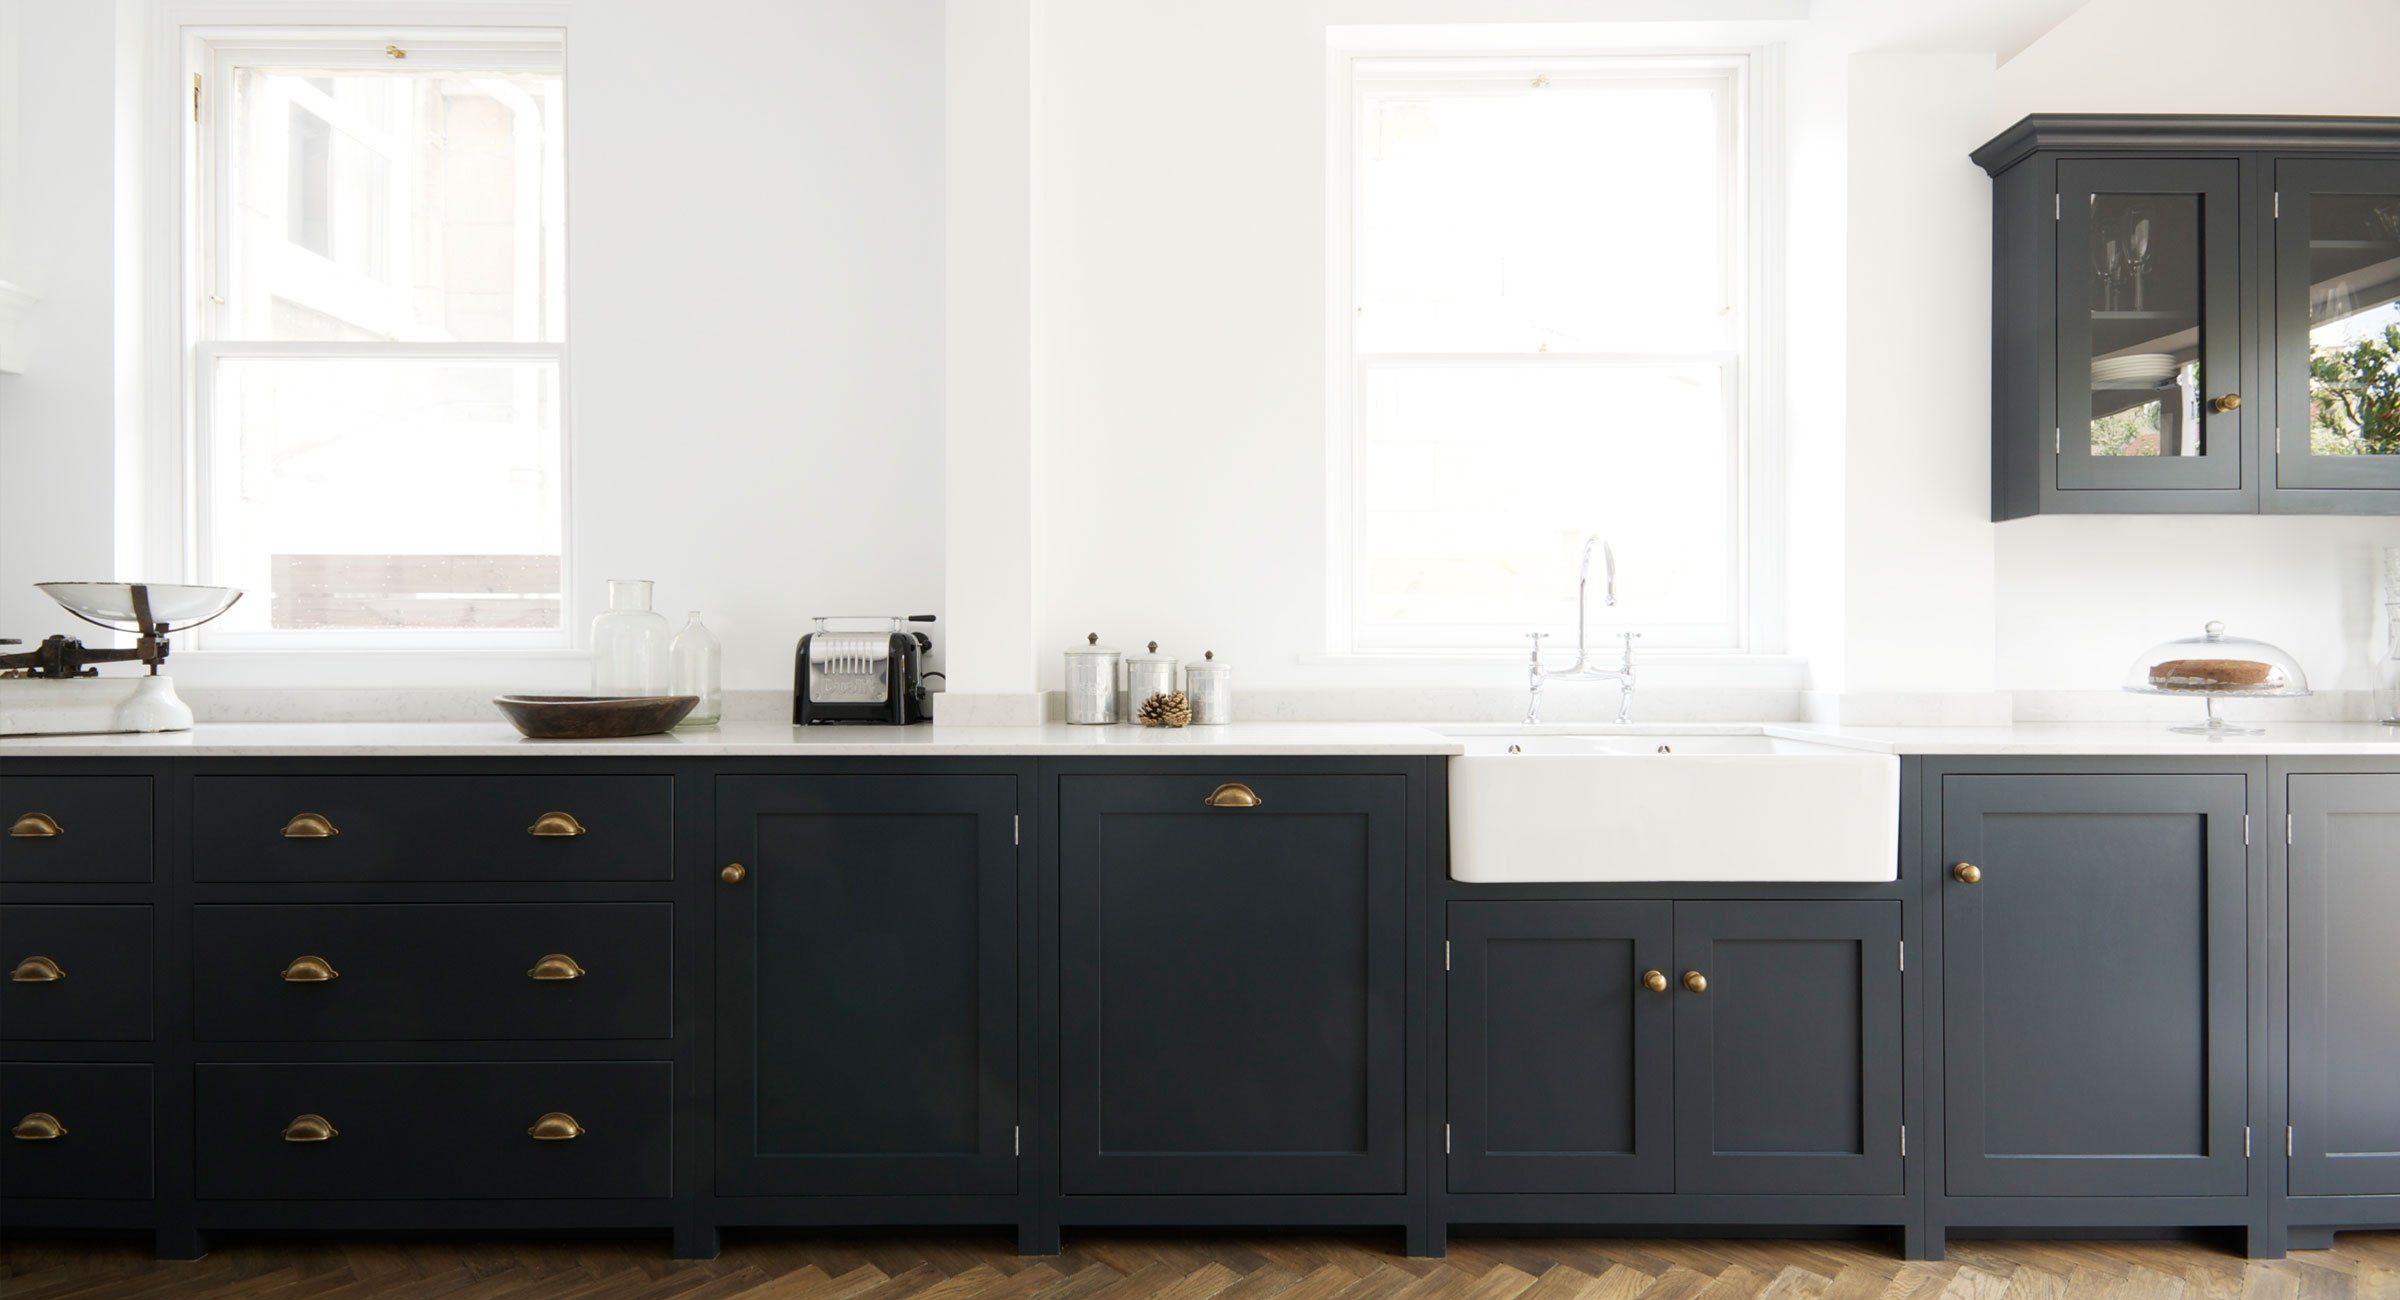 Shaker Kitchens by deVOL - Handmade Painted English Kitchens ...